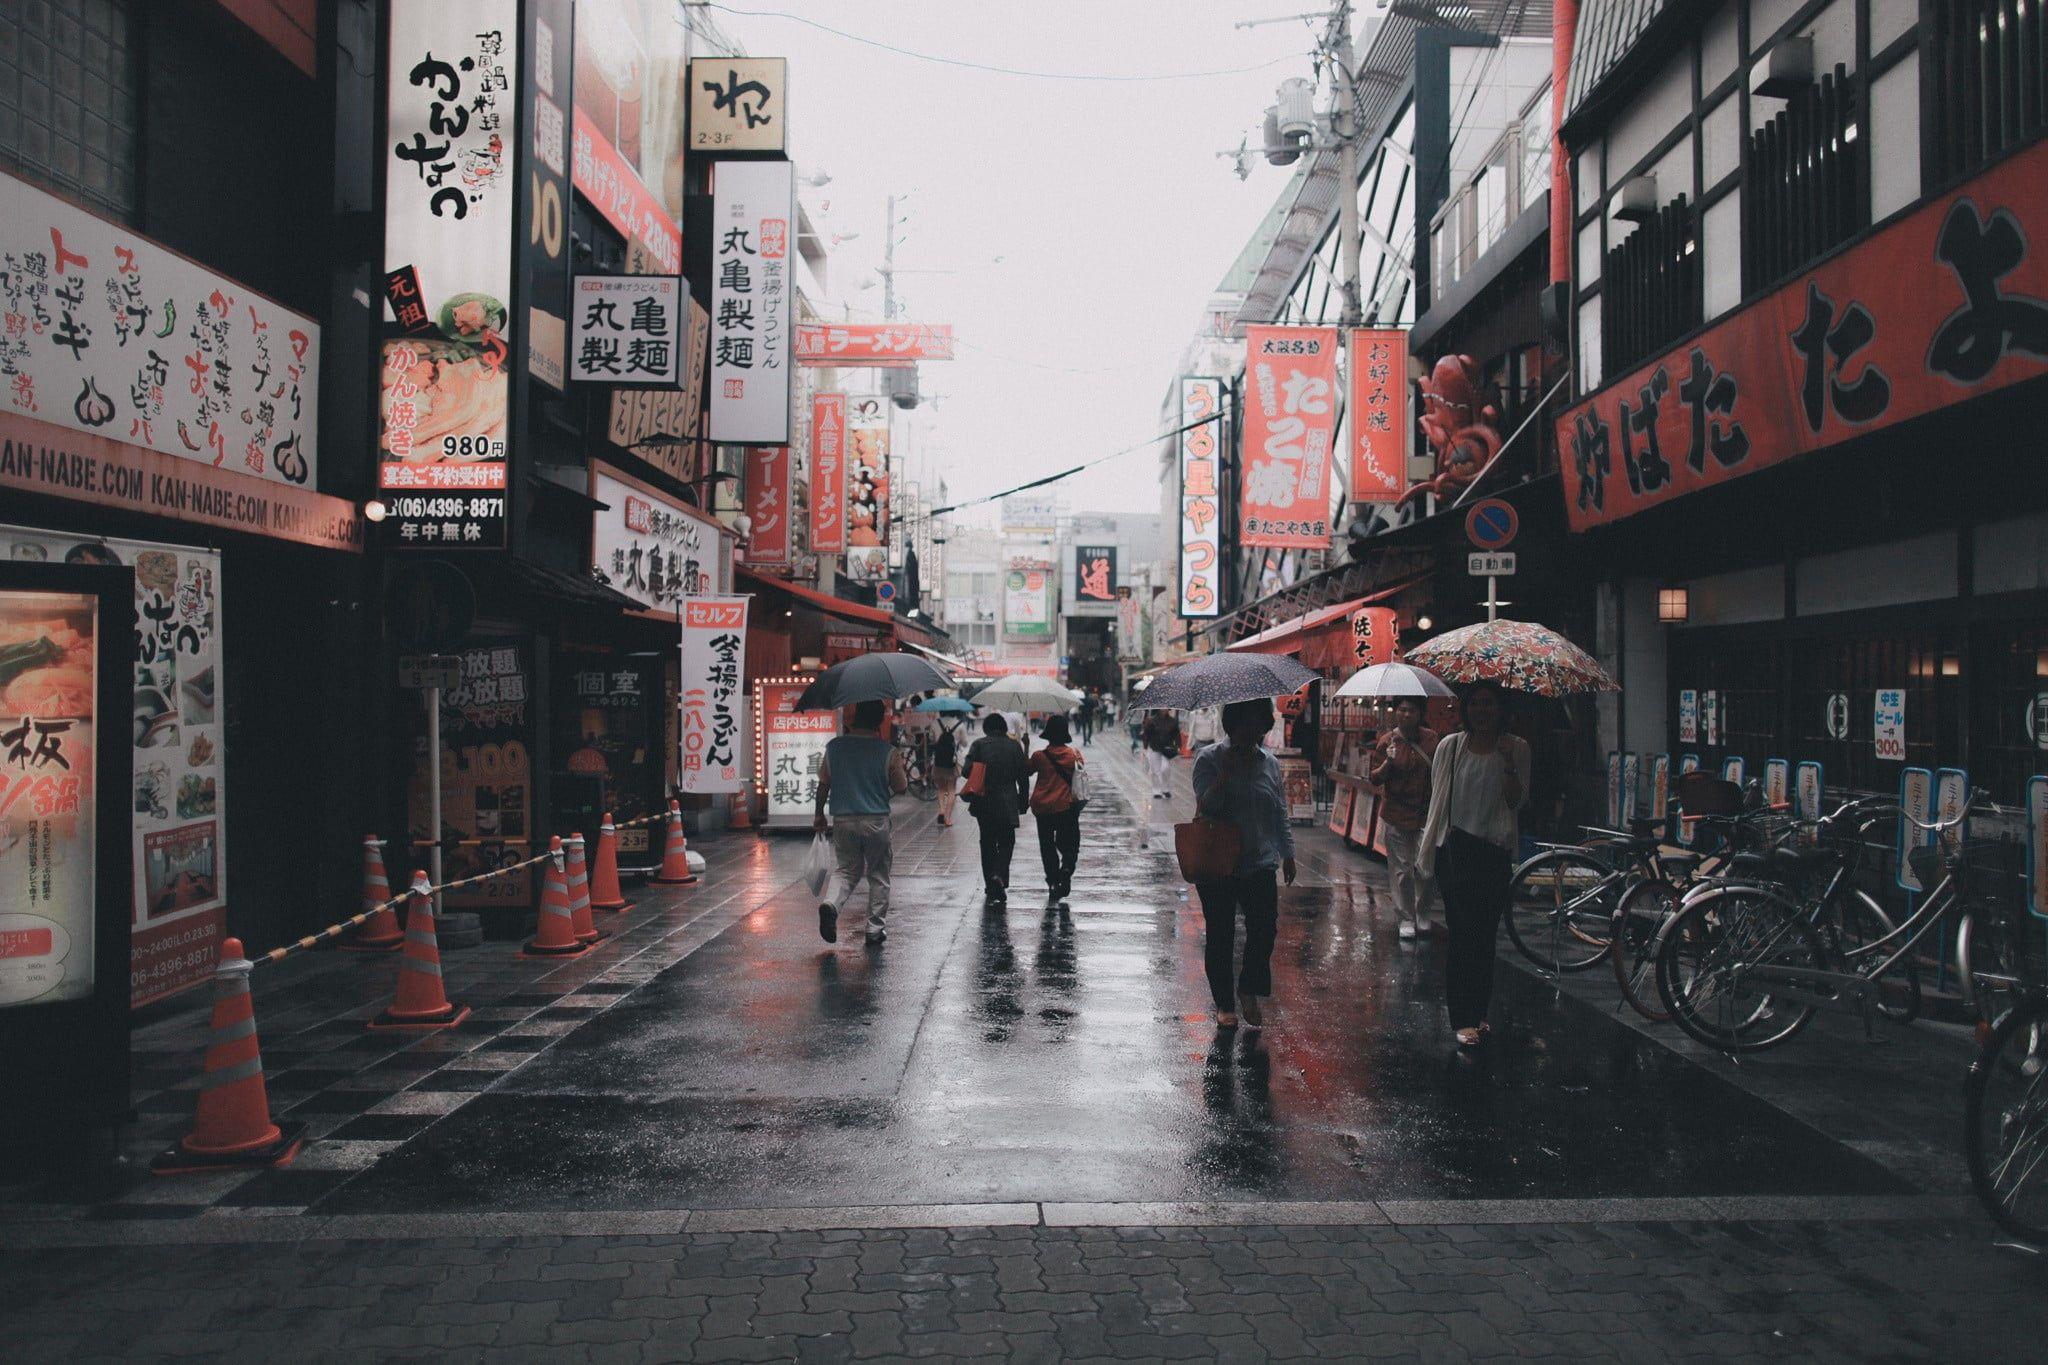 black umbrella umbrella Asian street Japan Japanese